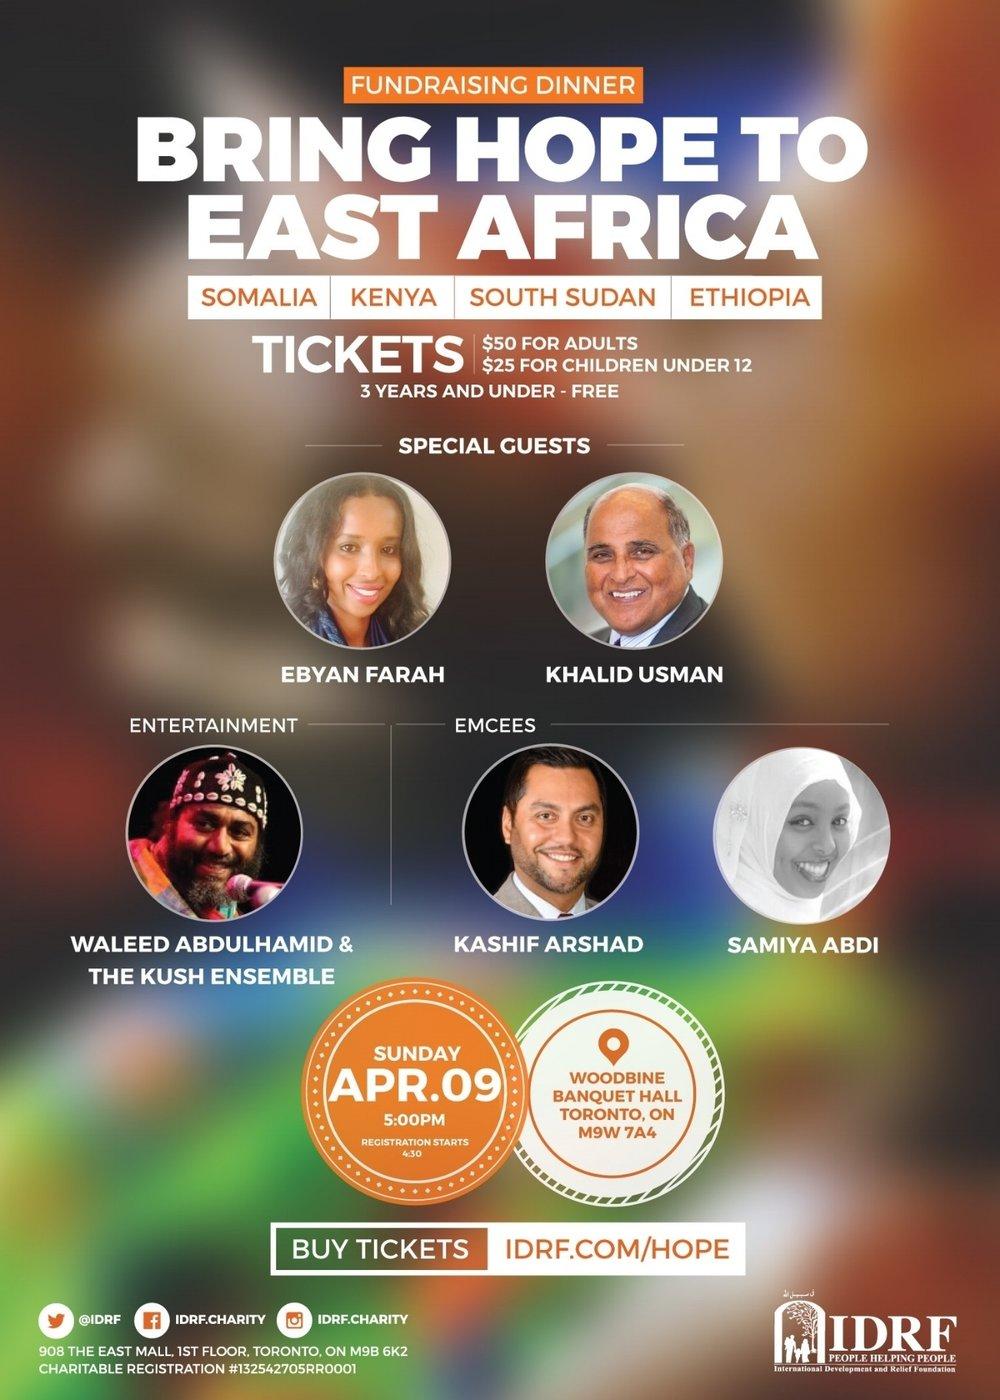 4/9 - Bring Hope To East Africa, Toronto, Ontario